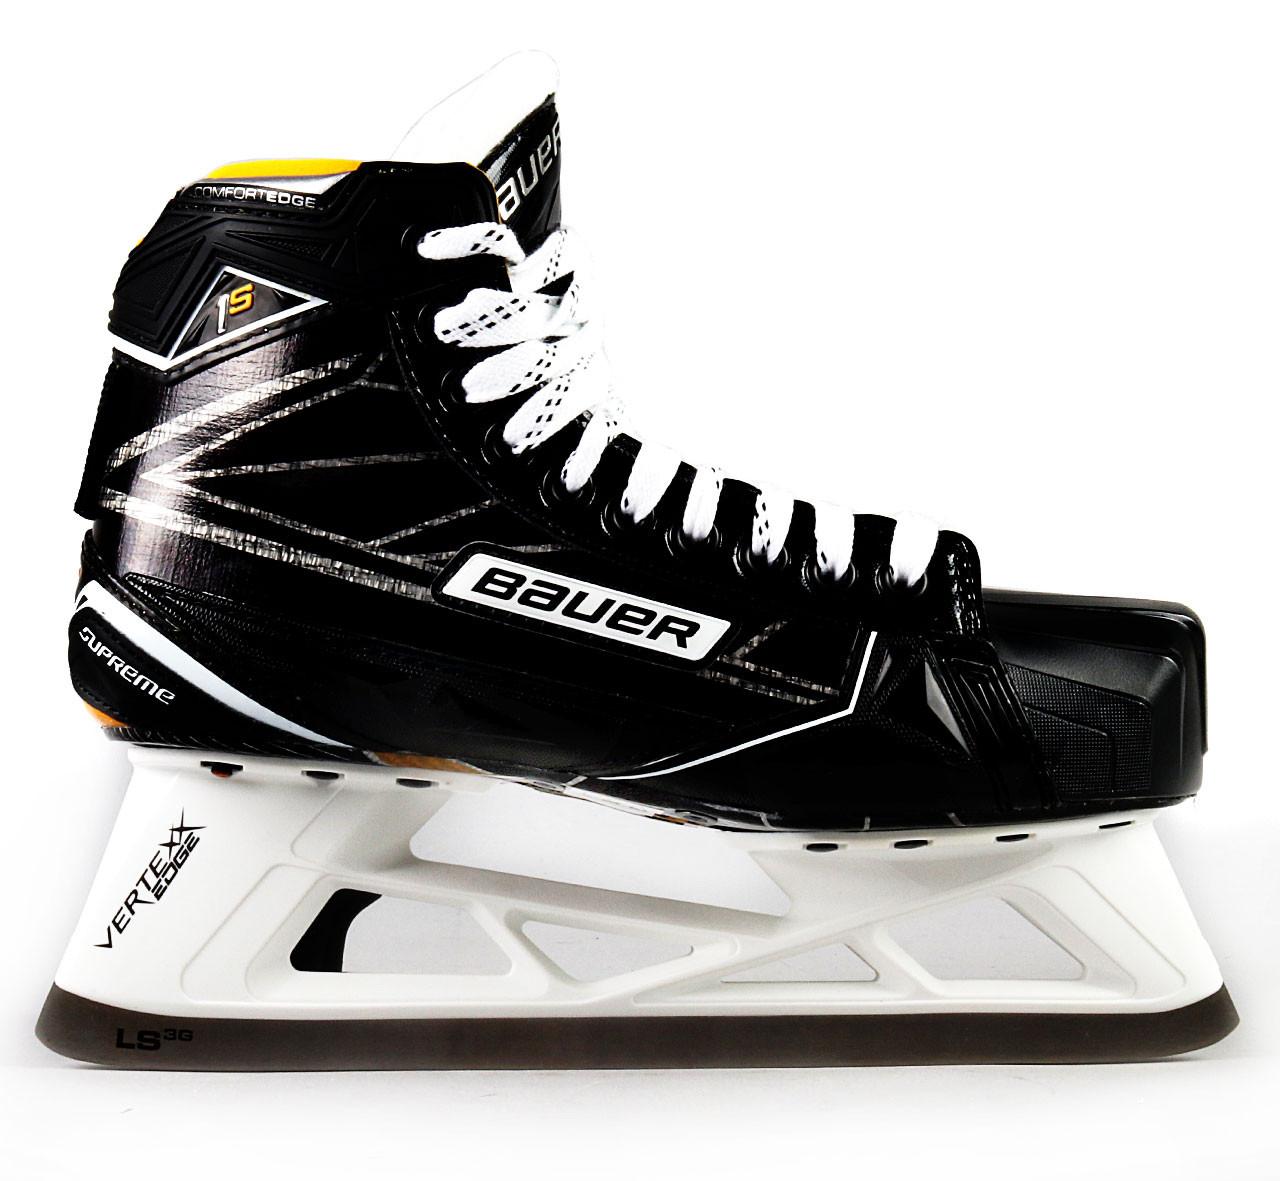 Size 6 5 / 6 5 - Bauer Supreme 1S Skates - Team Stock